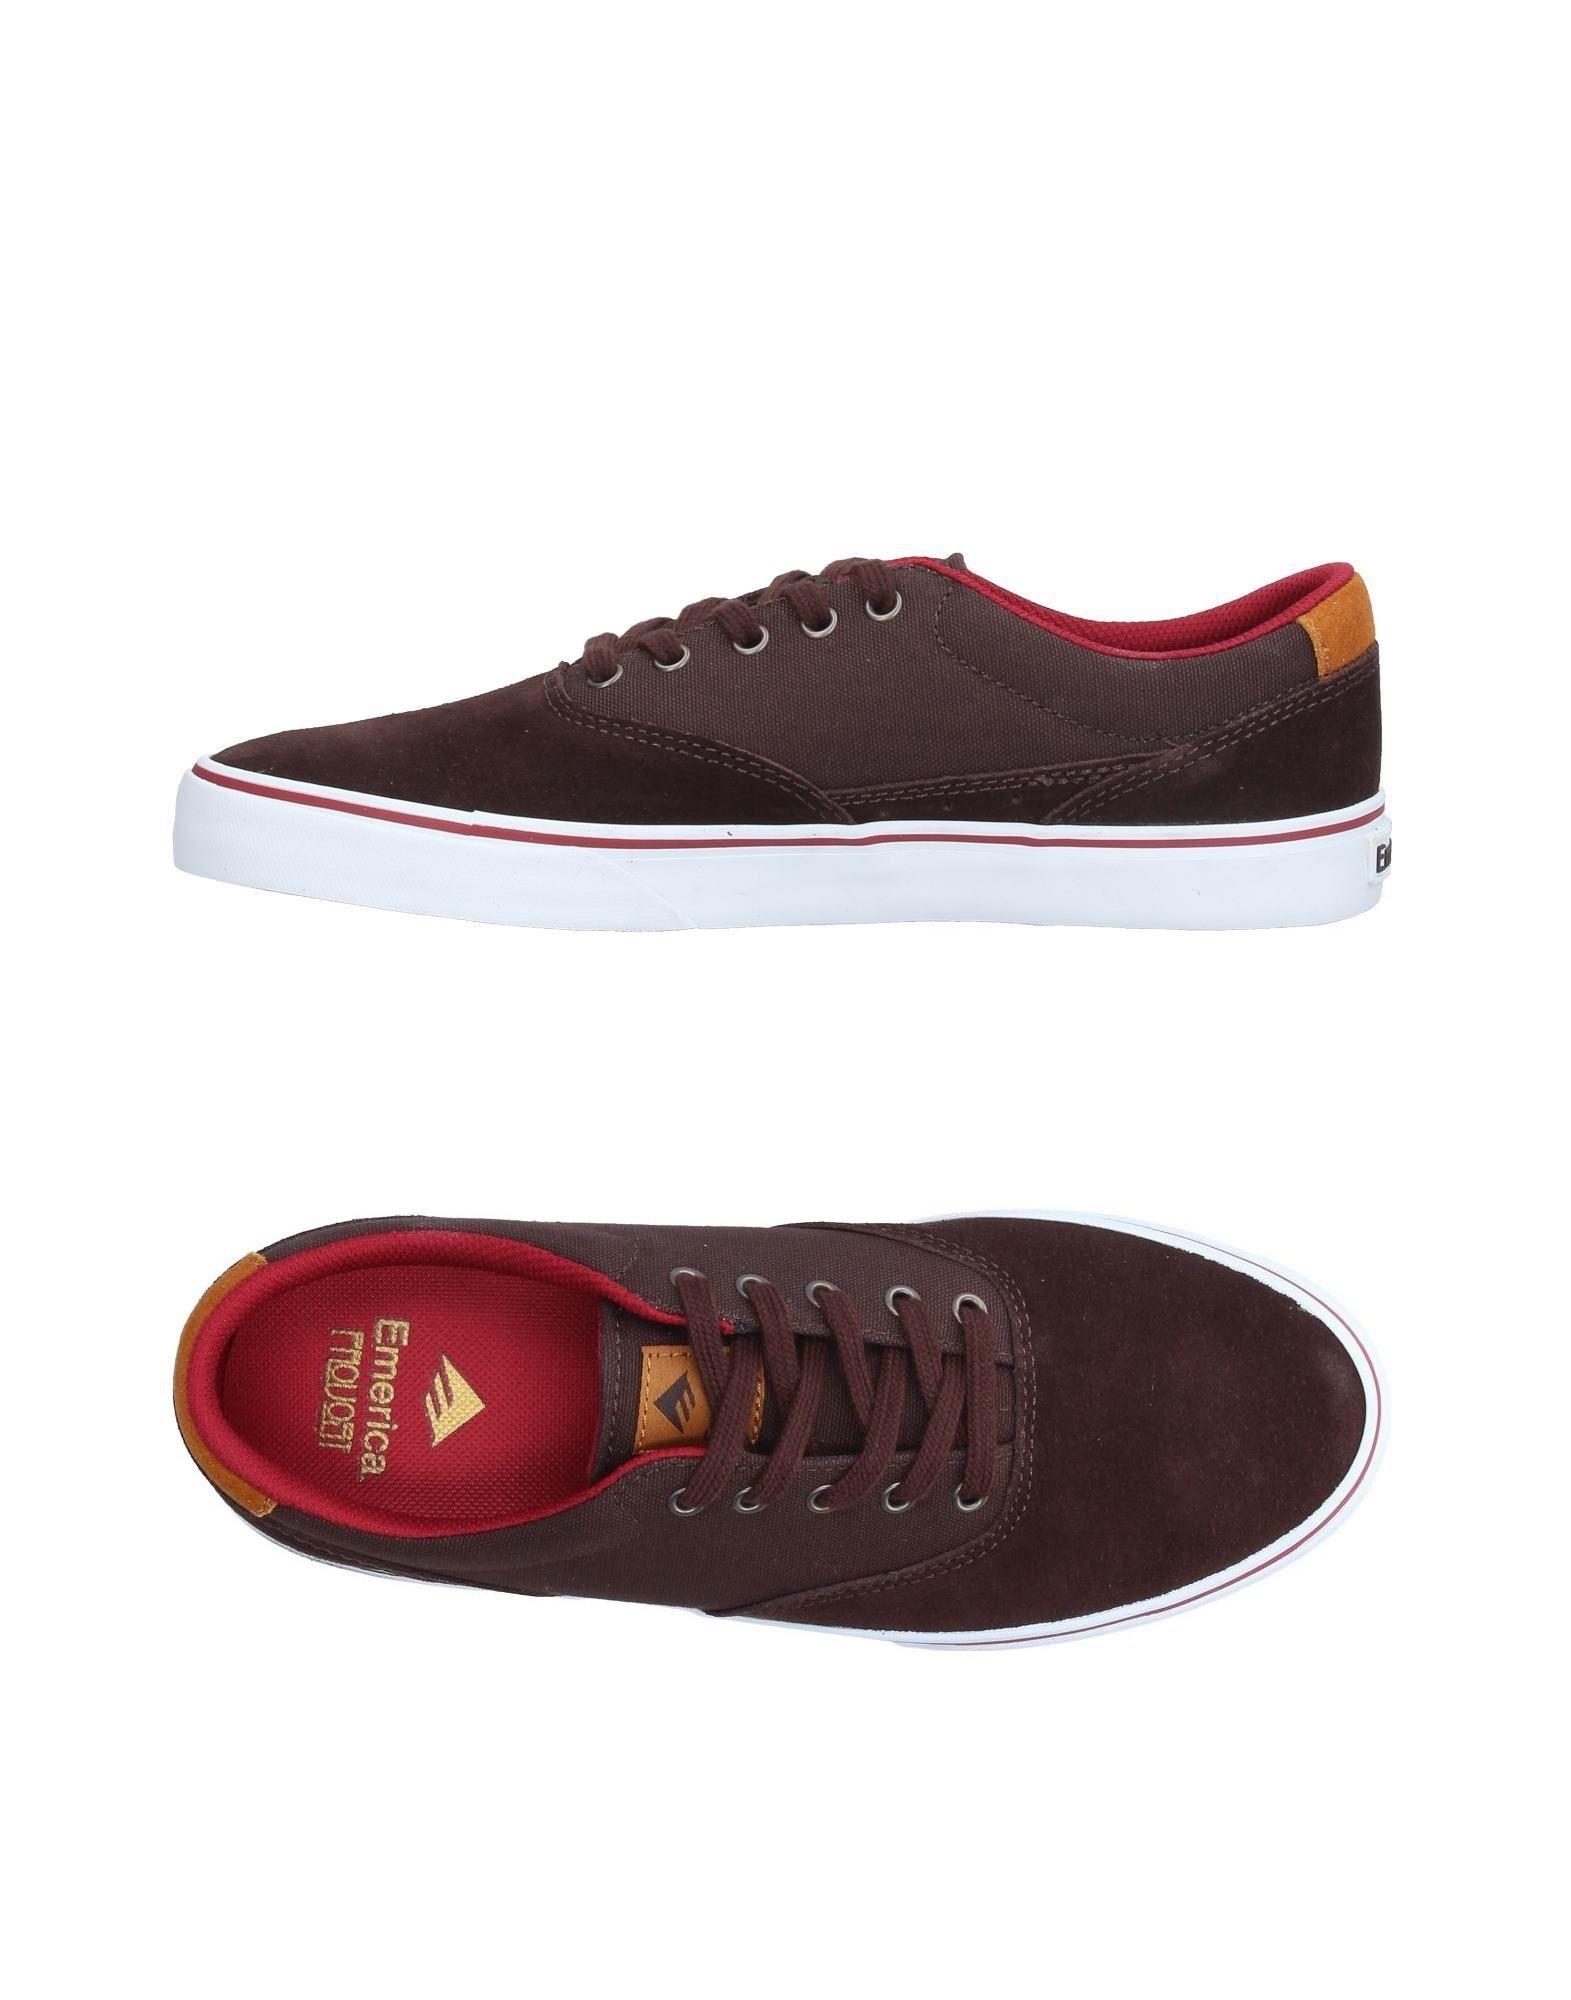 EMERICA Herren Low Sneakers & Tennisschuhe Farbe Dunkelbraun Größe 1